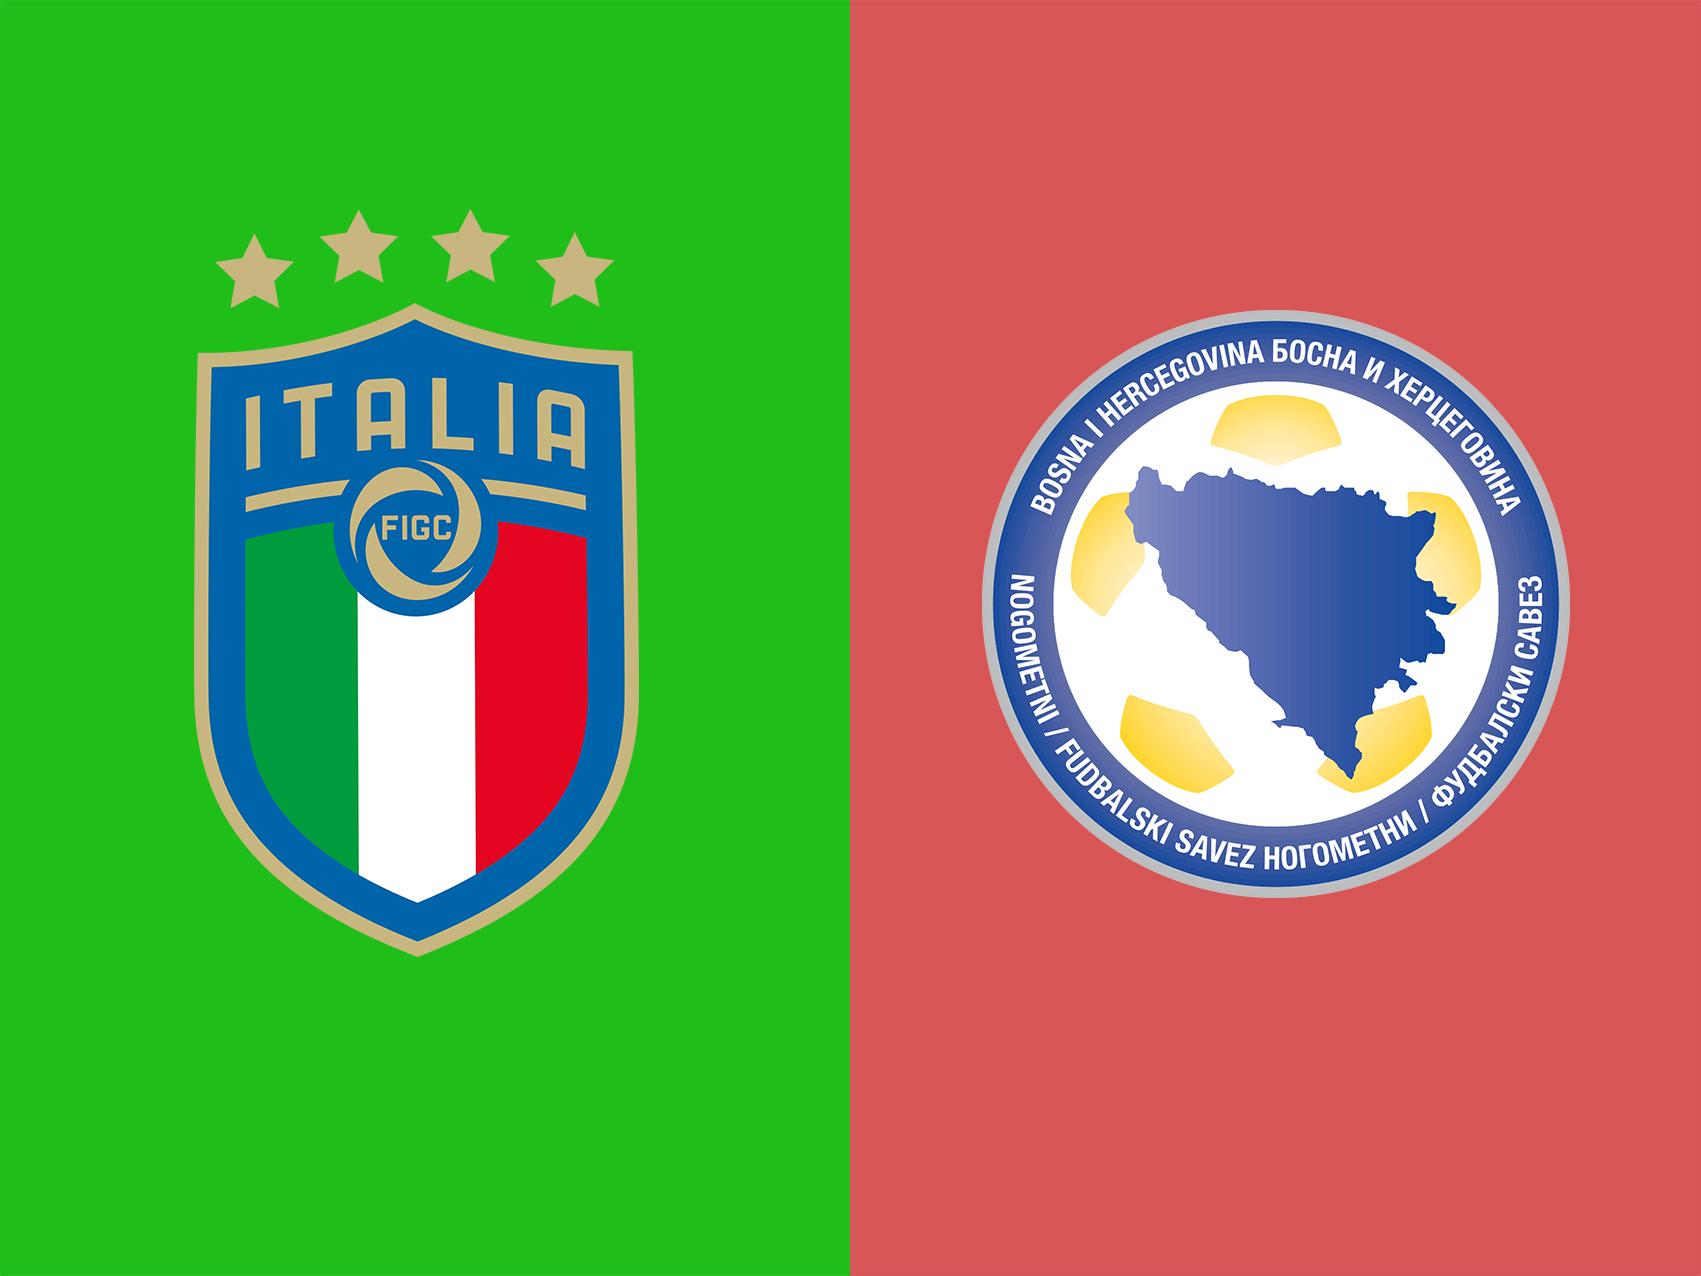 italia-vs-bosnia-soi-keo-vong-loai-chau-au-12-06-thanh-turin-toa-nang-0